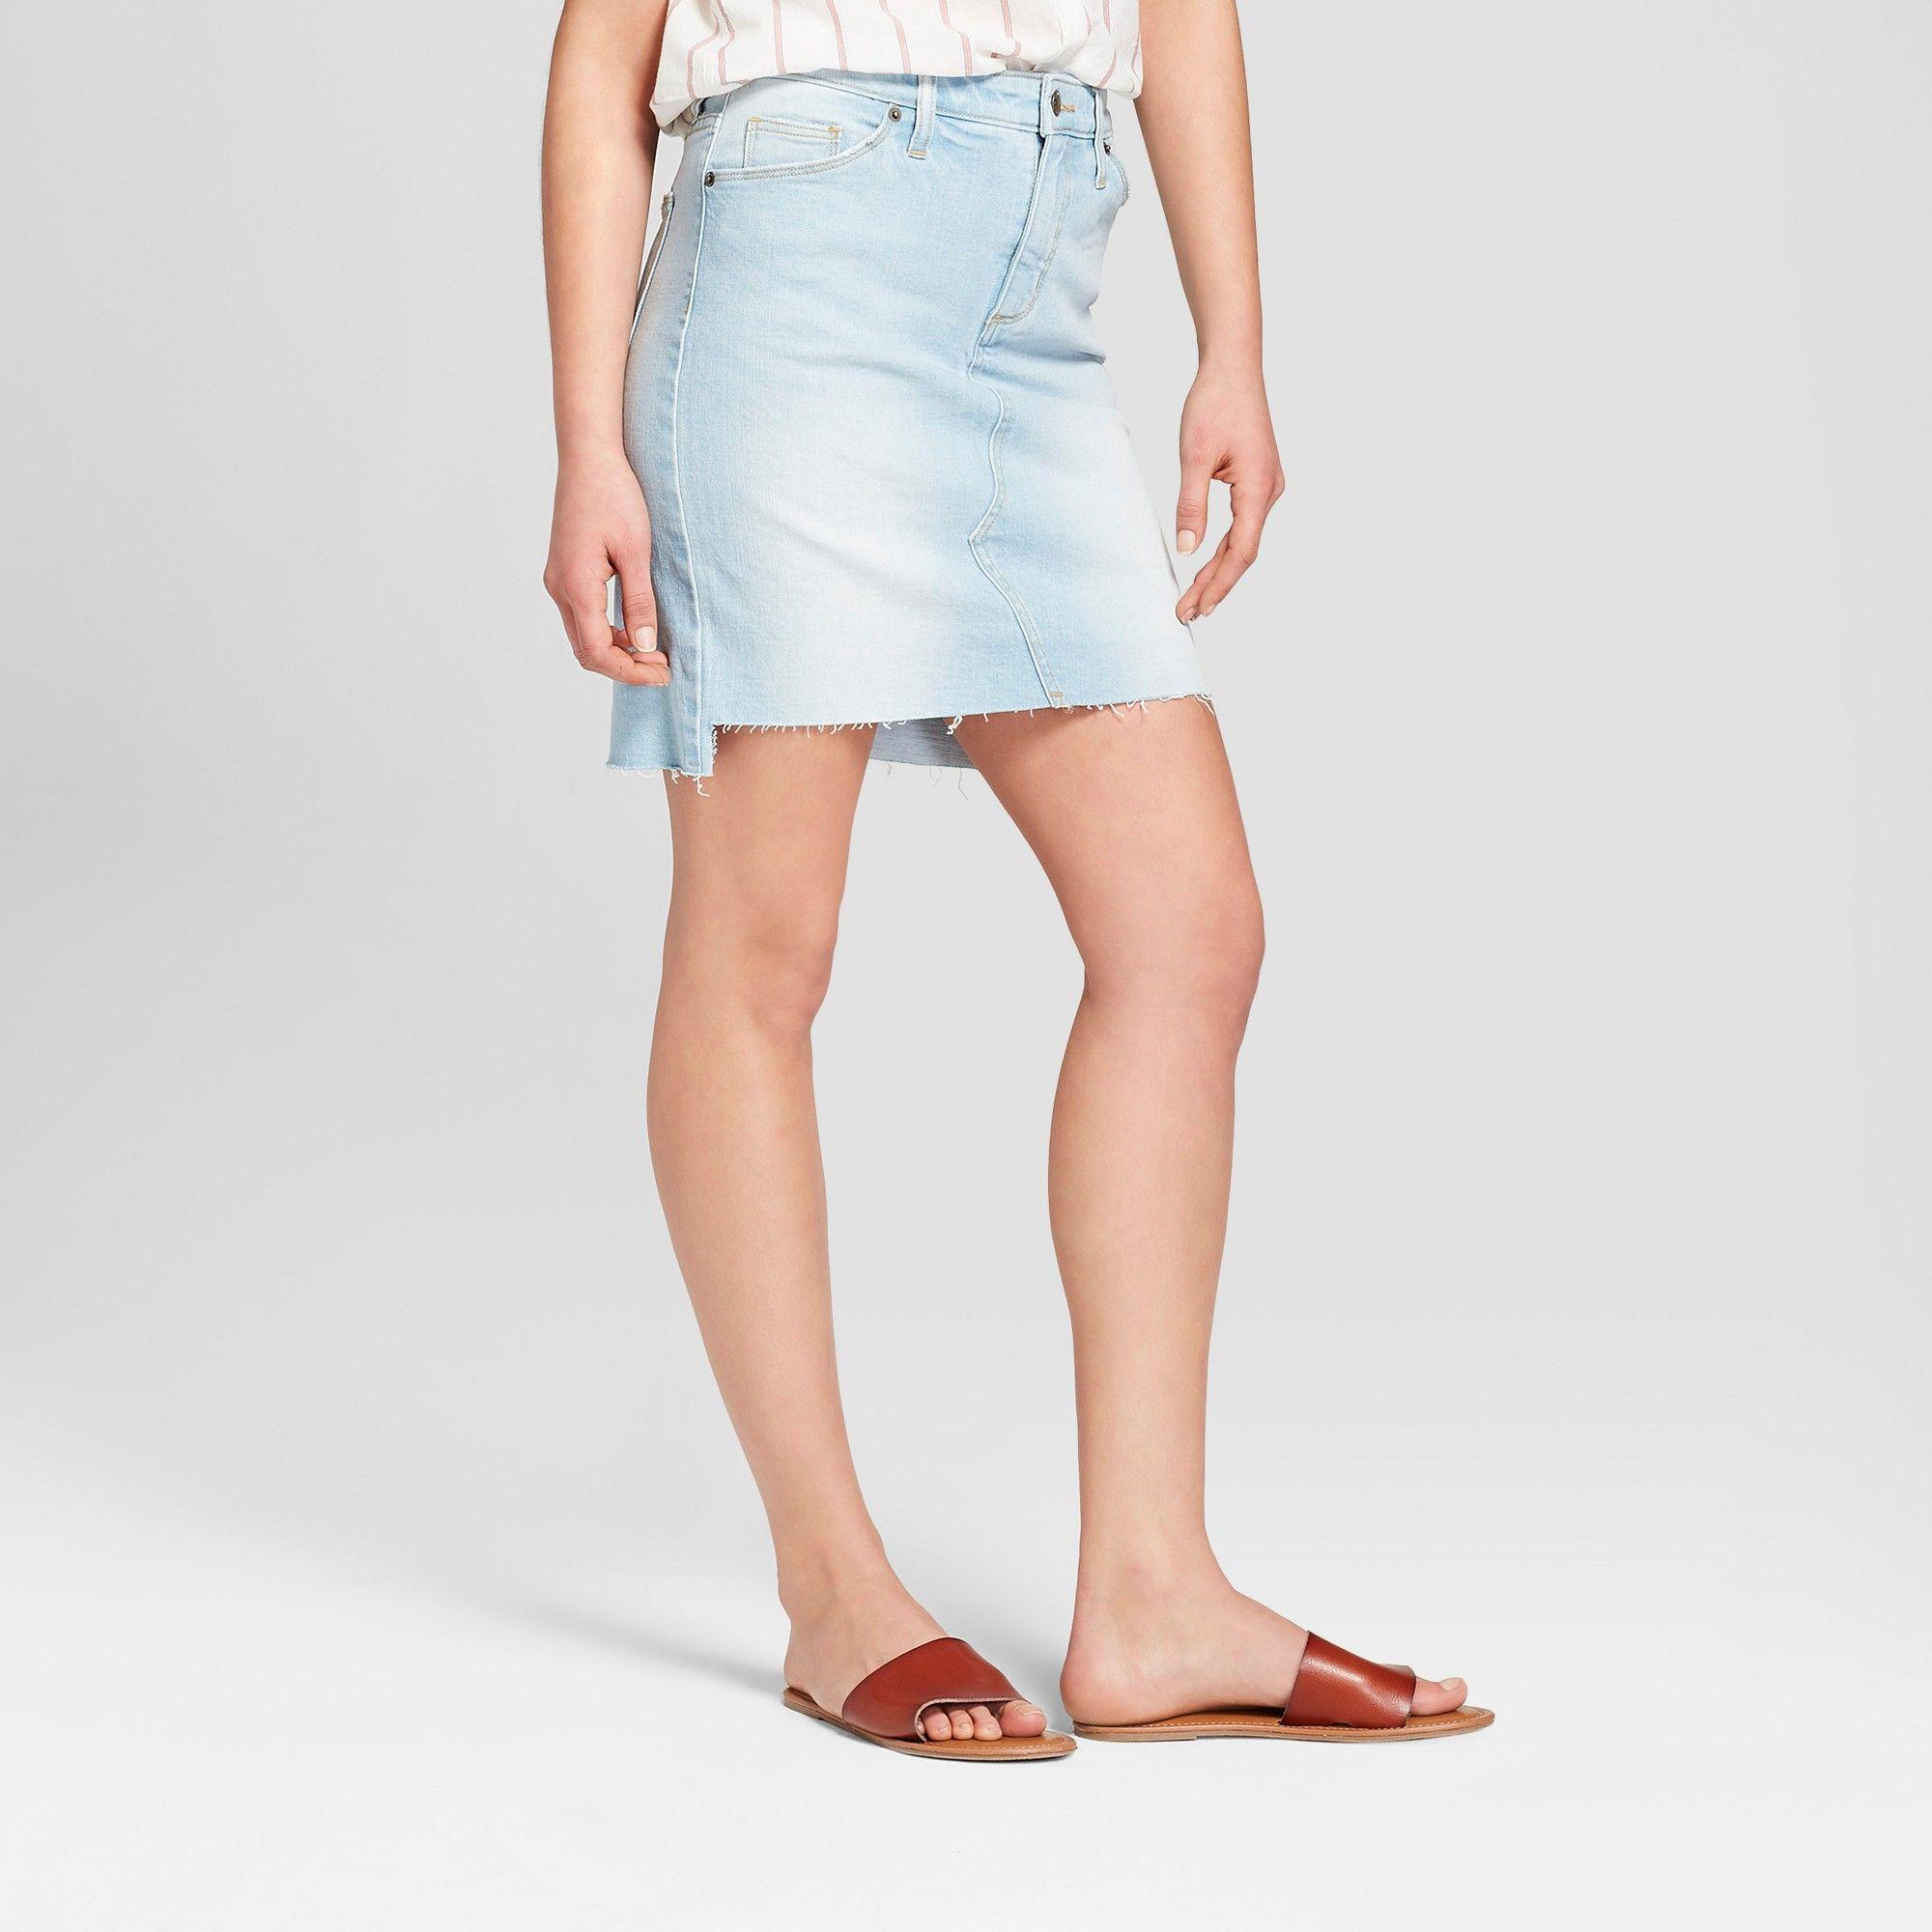 d957386ac0 Women s Denim Skirt - Universal Thread Light Wash 4